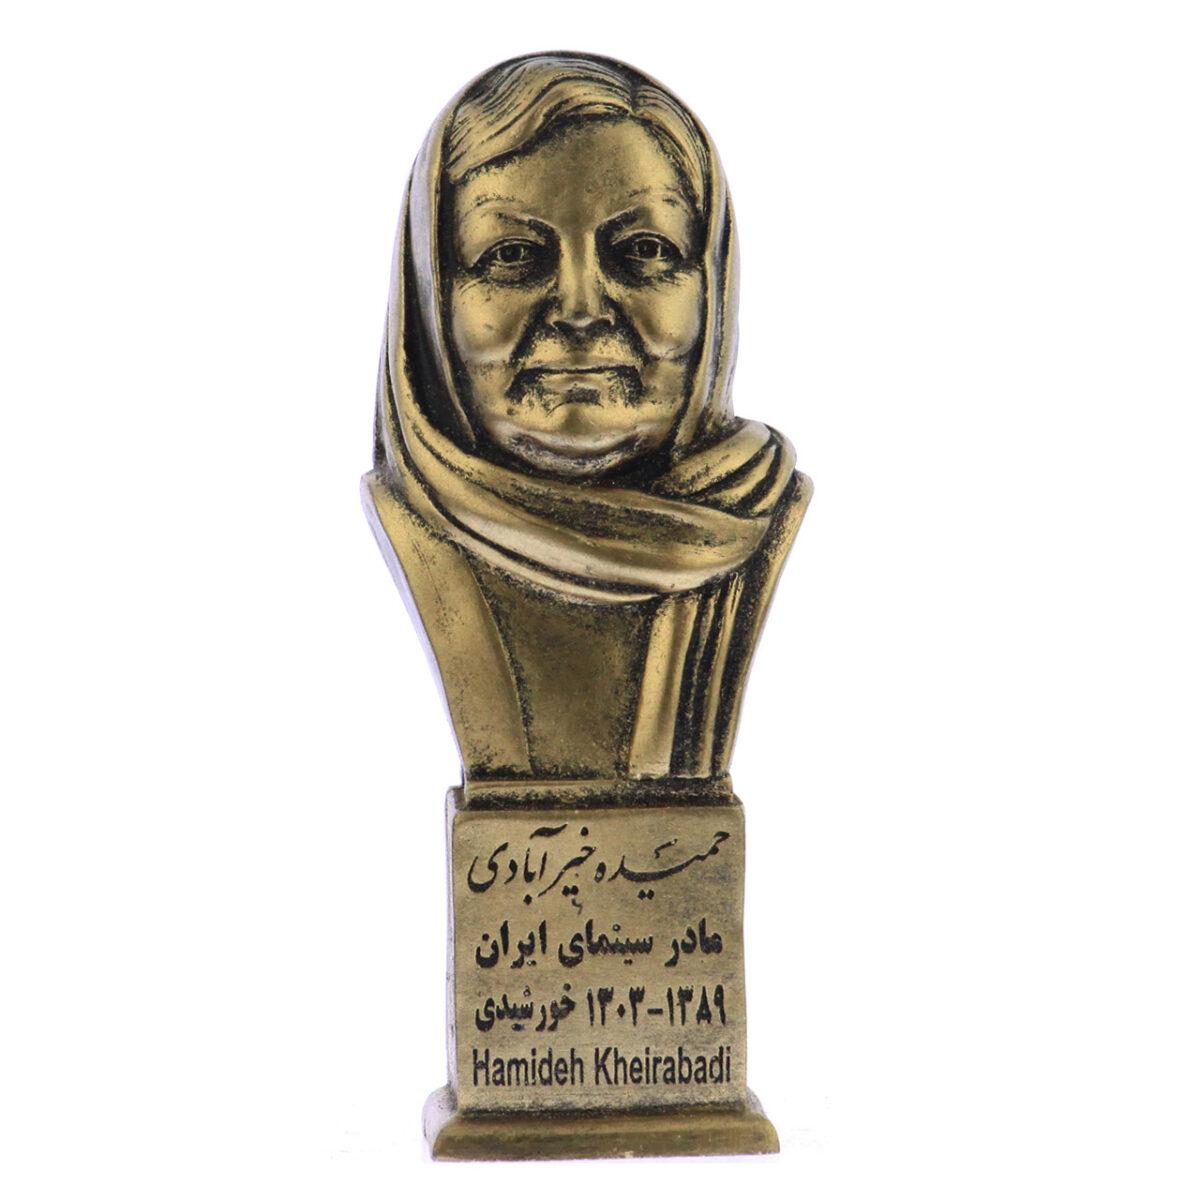 hamideh kheirabadi b 1200x1200 - سردیس خانم حمیده خیر آبادی